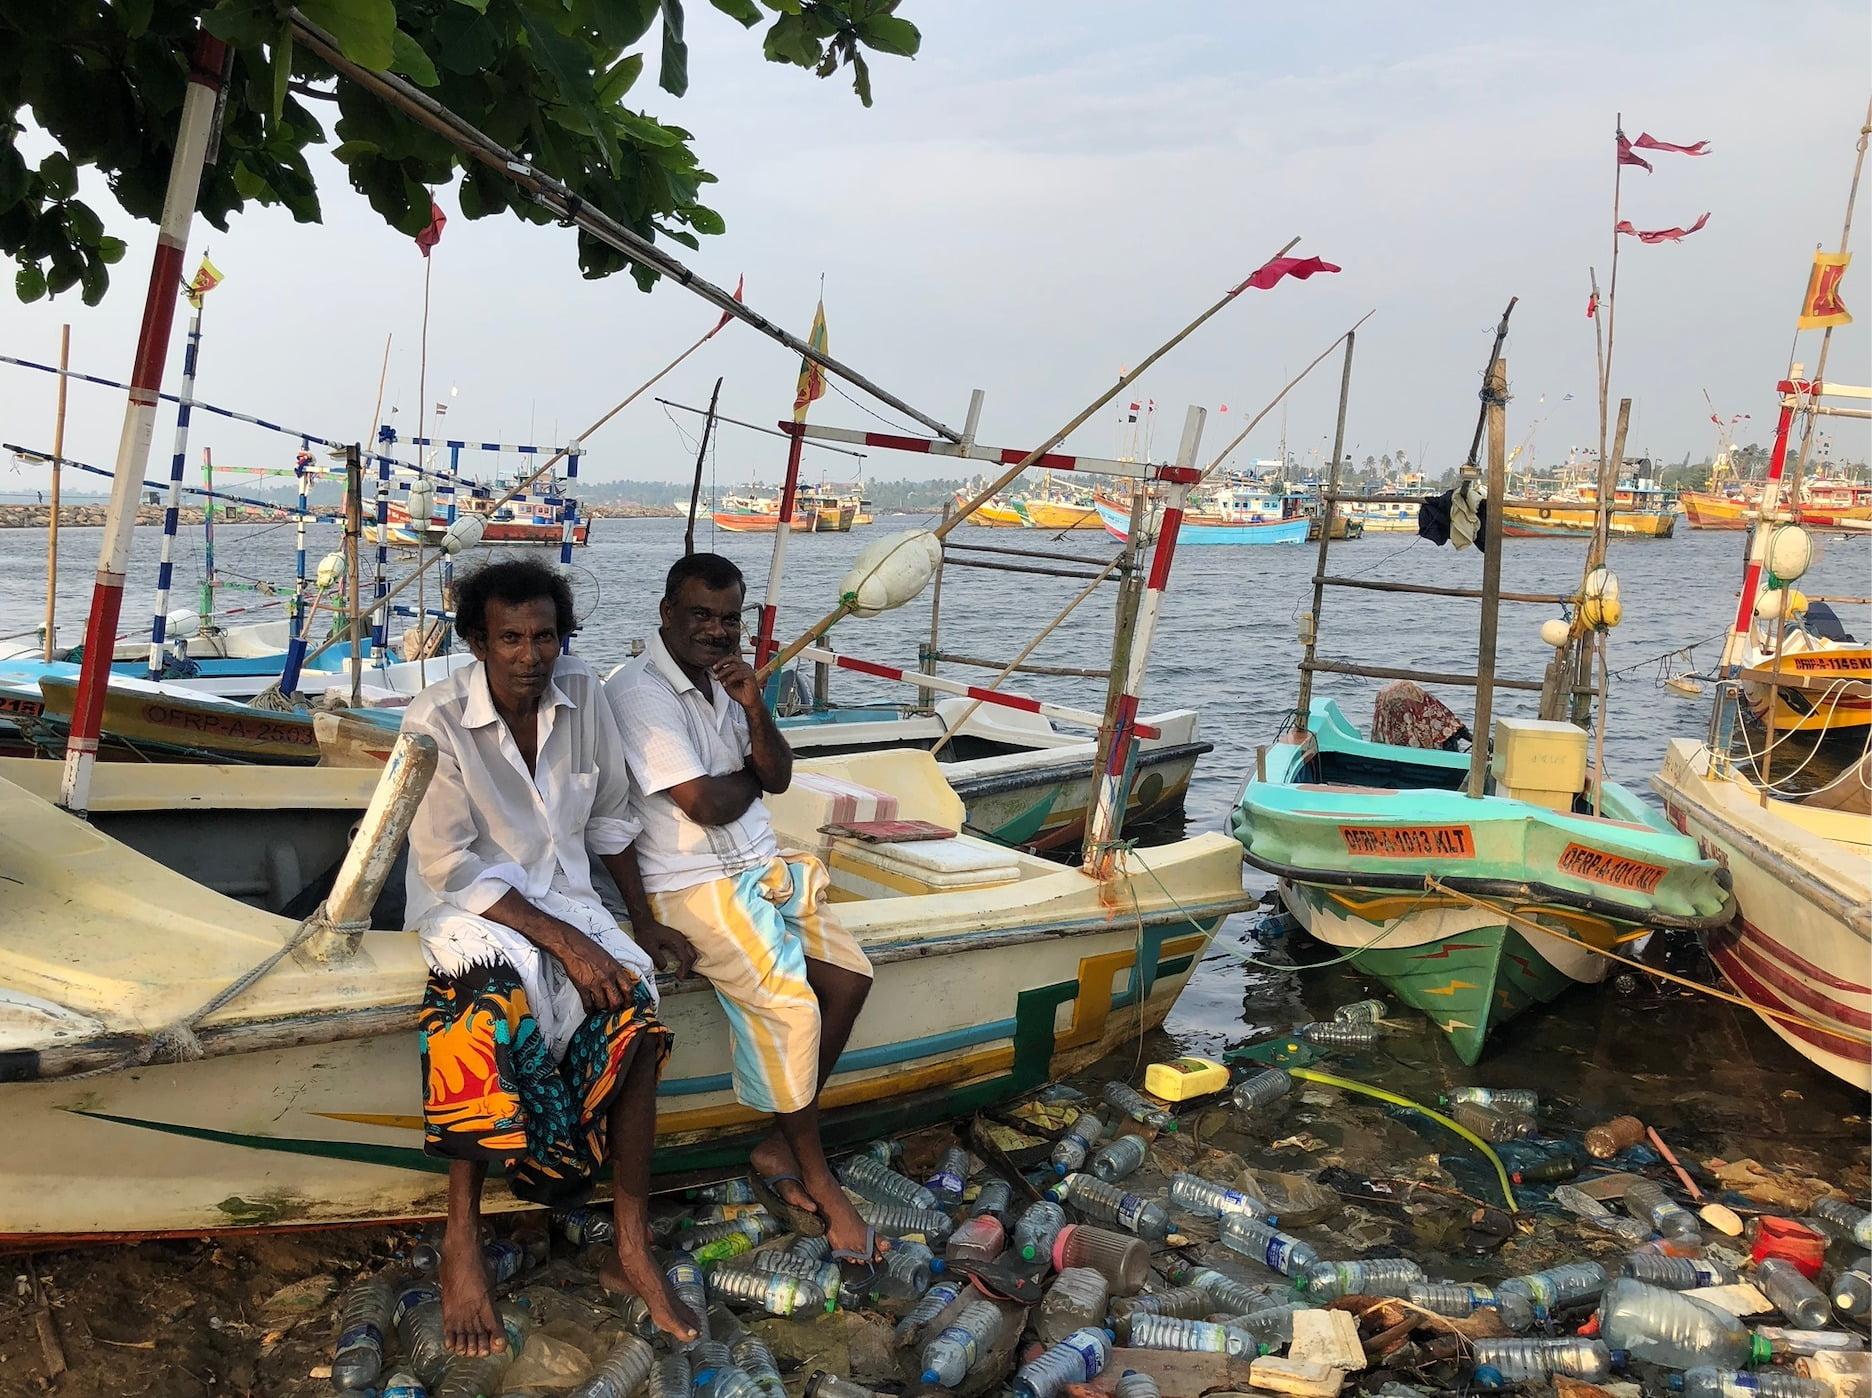 Litter, Pollution, Harbor, Waste, Boat, Watercraft